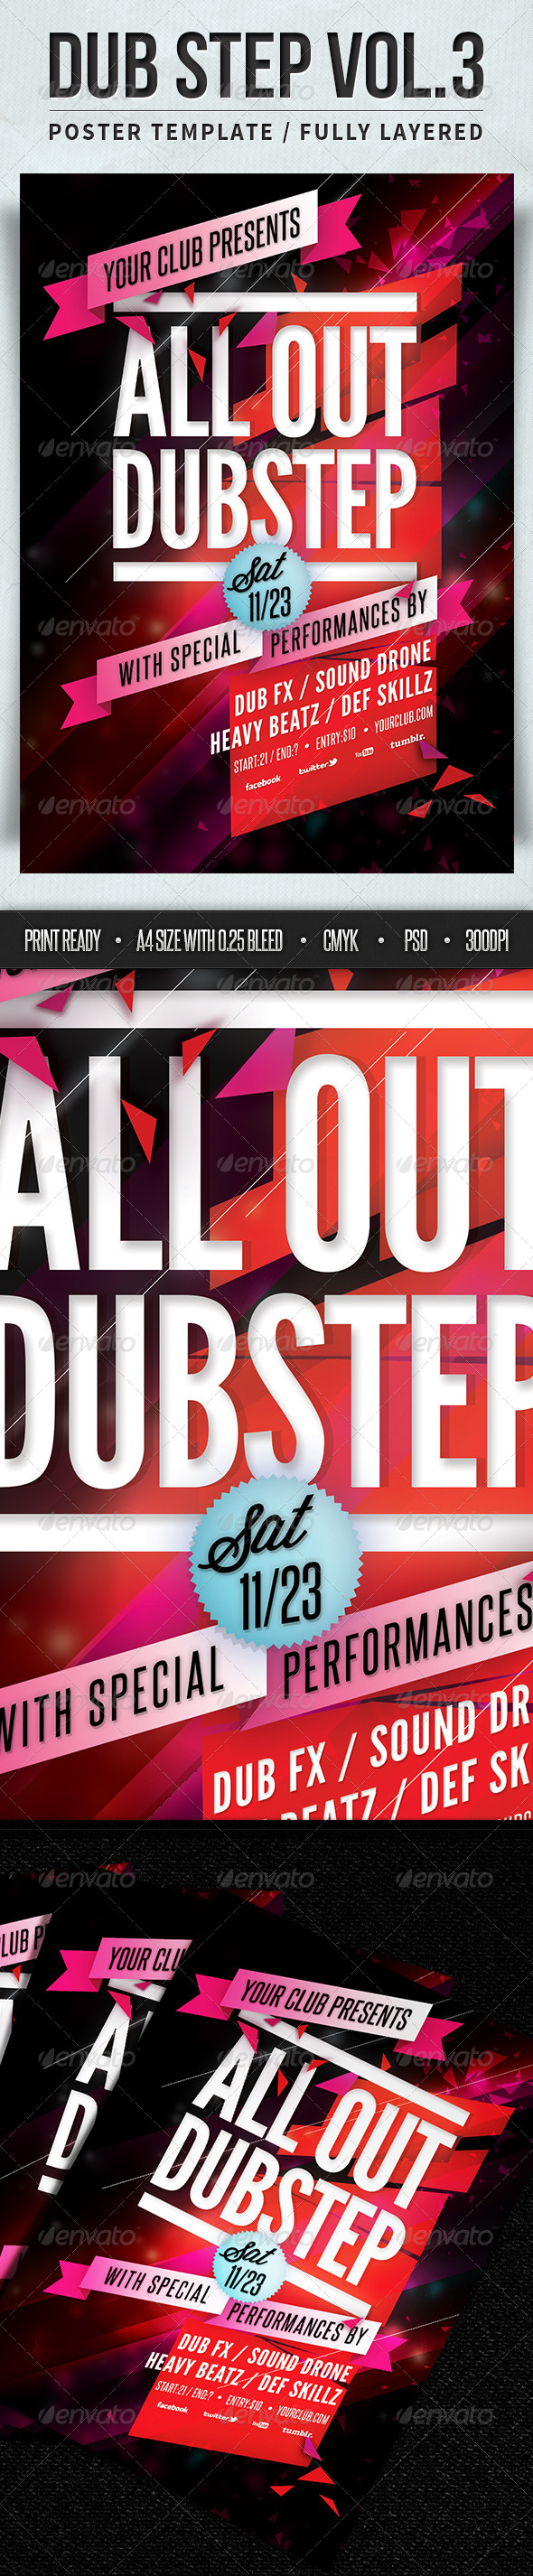 GraphicRiver Dub Step Poster Vol.3 4808740